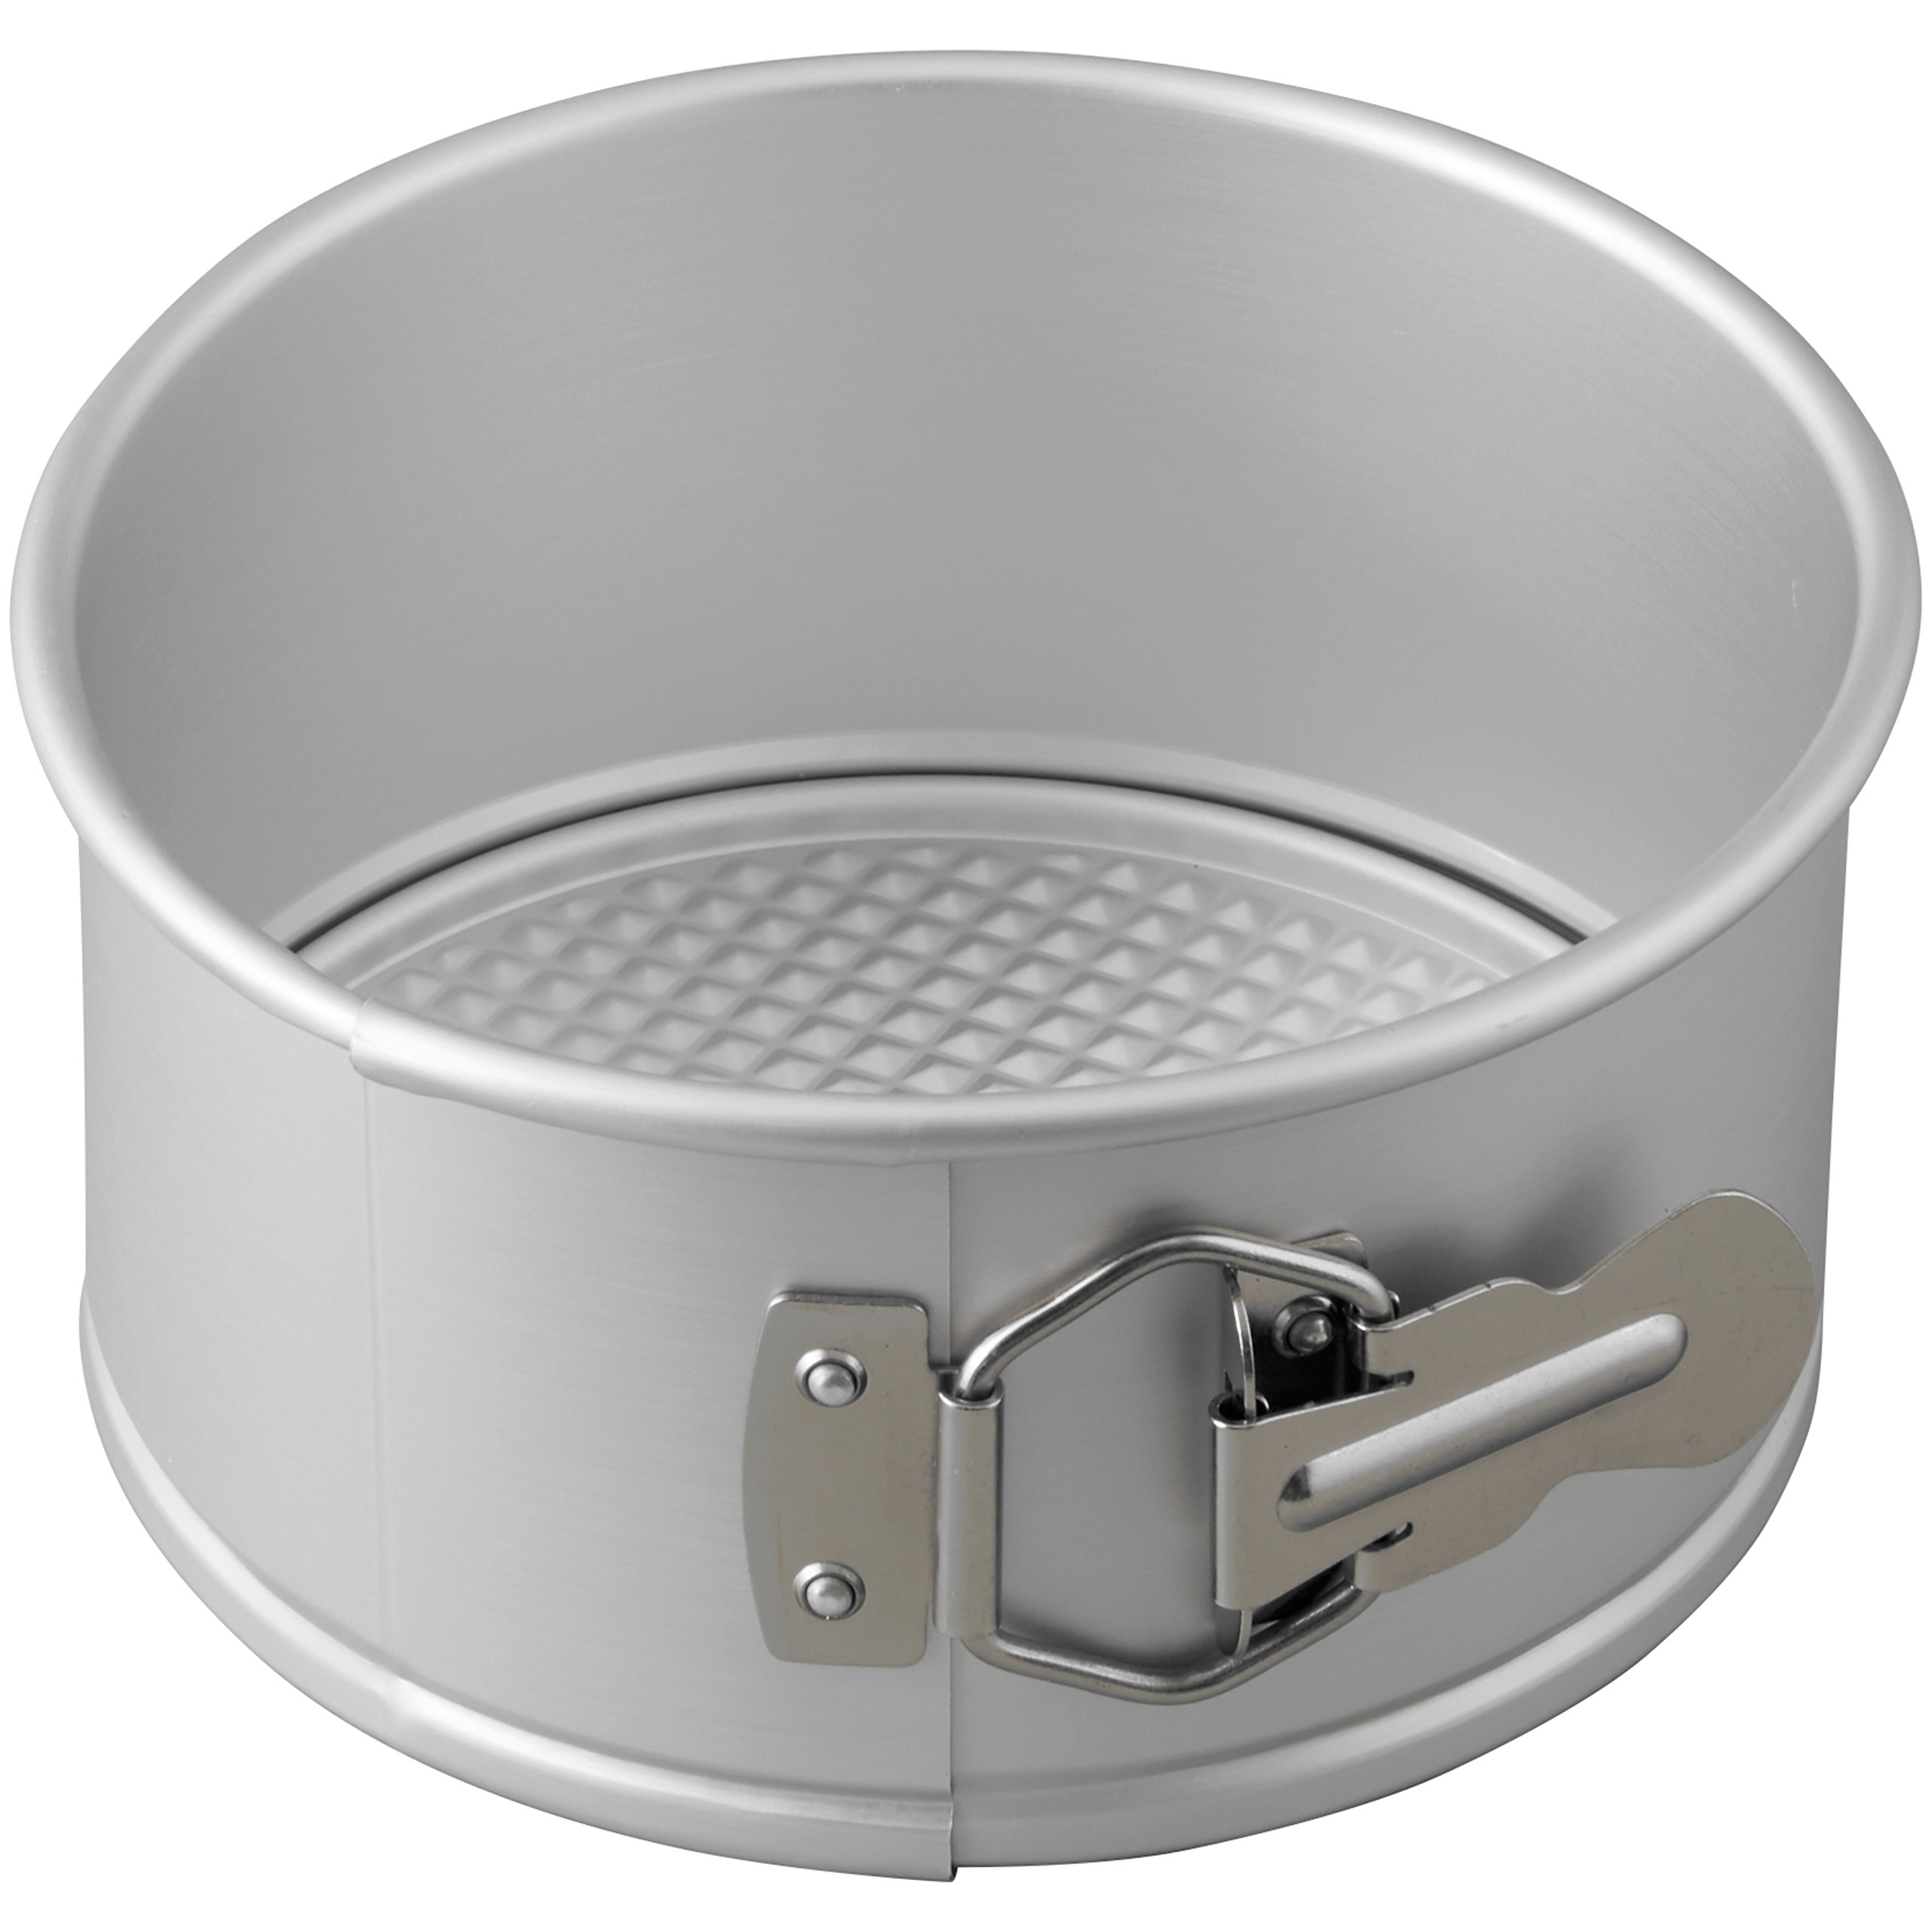 Wilton Aluminum 6 Inch Springform Pan